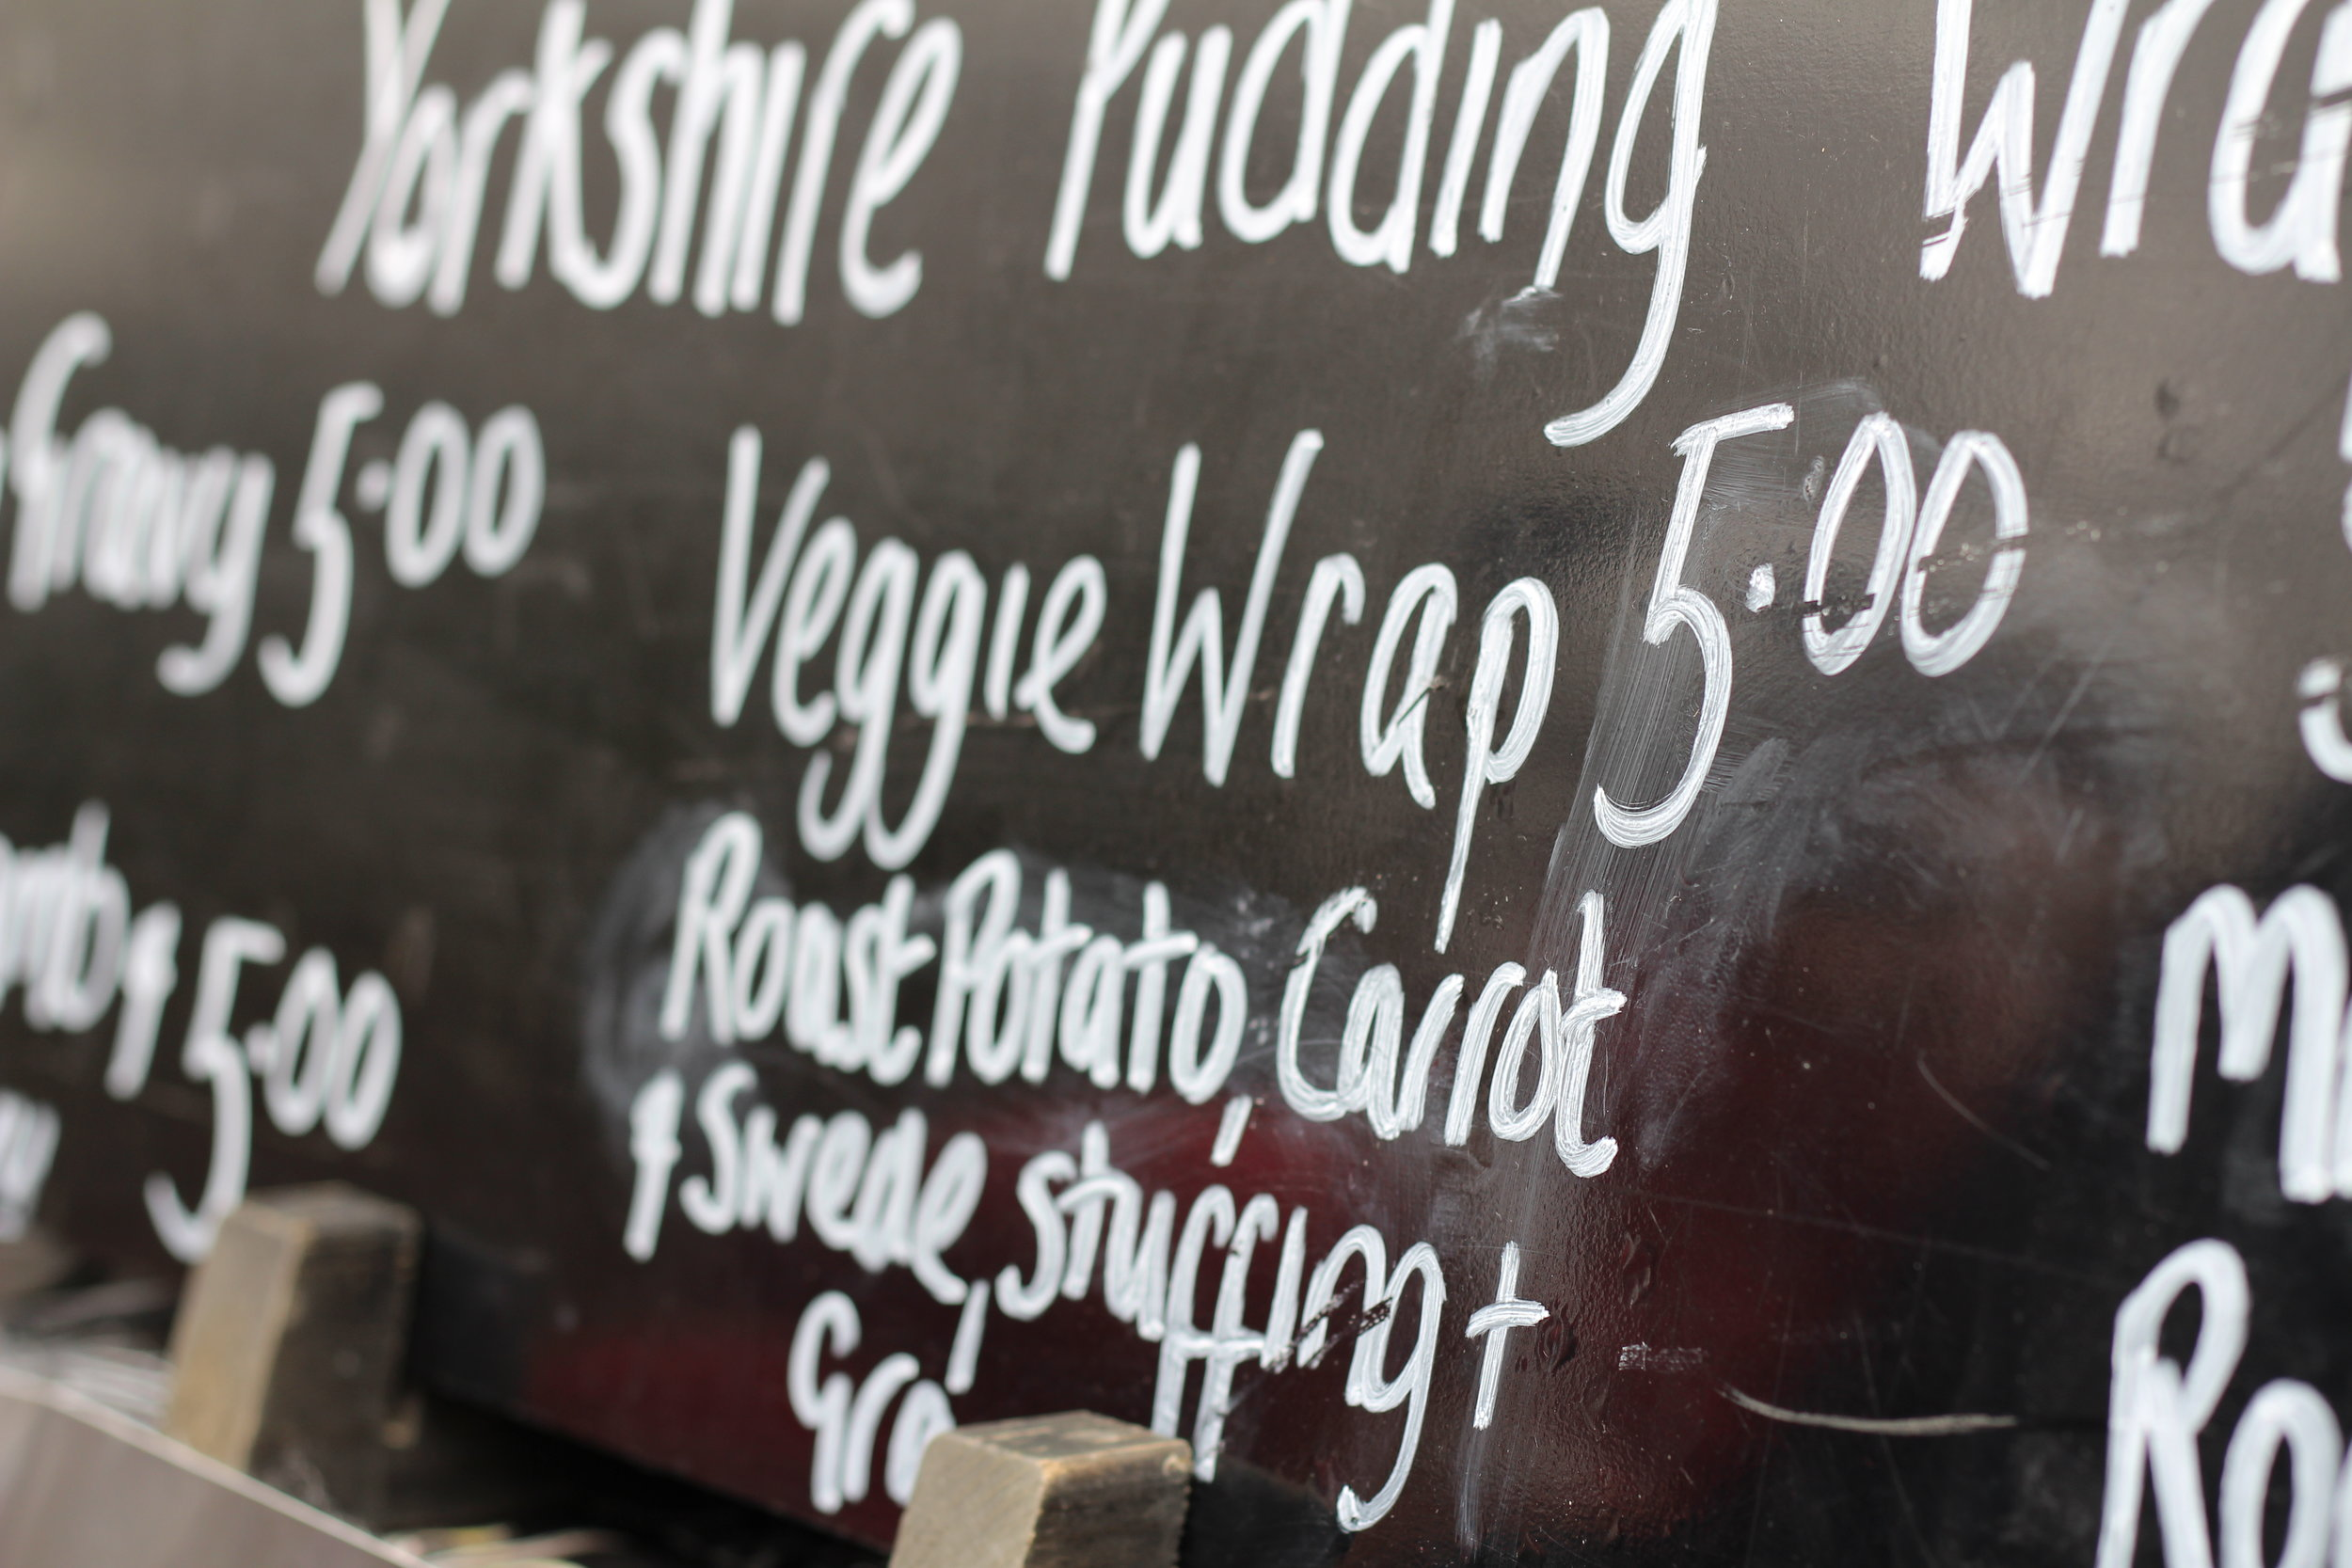 Veggie Yorkshire Pudding Wrap - The veg version had more stuff in it than my boyfriend's lamb one!